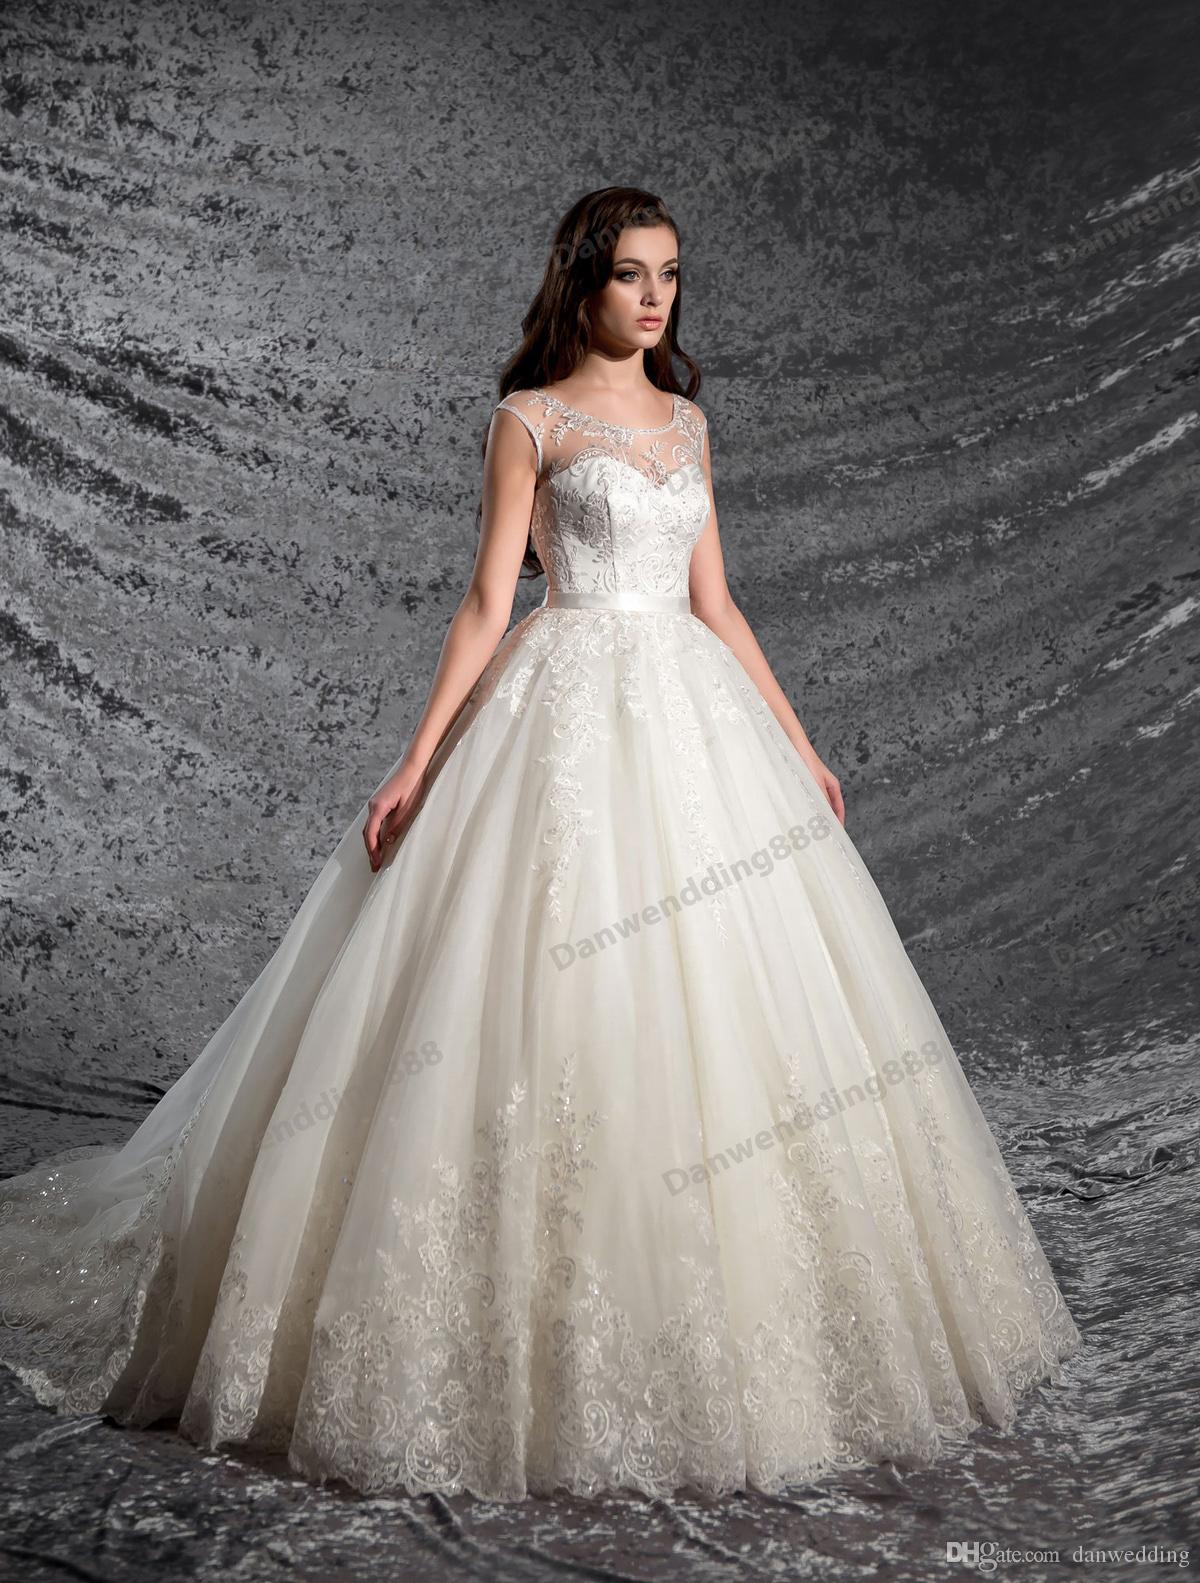 Grace Ivory Tulle Scoop Applique Beads A-Line Wedding Dresses Bridal Pageant Dresses Wedding Attire Dresses Custom Size 2-16 ZW606012